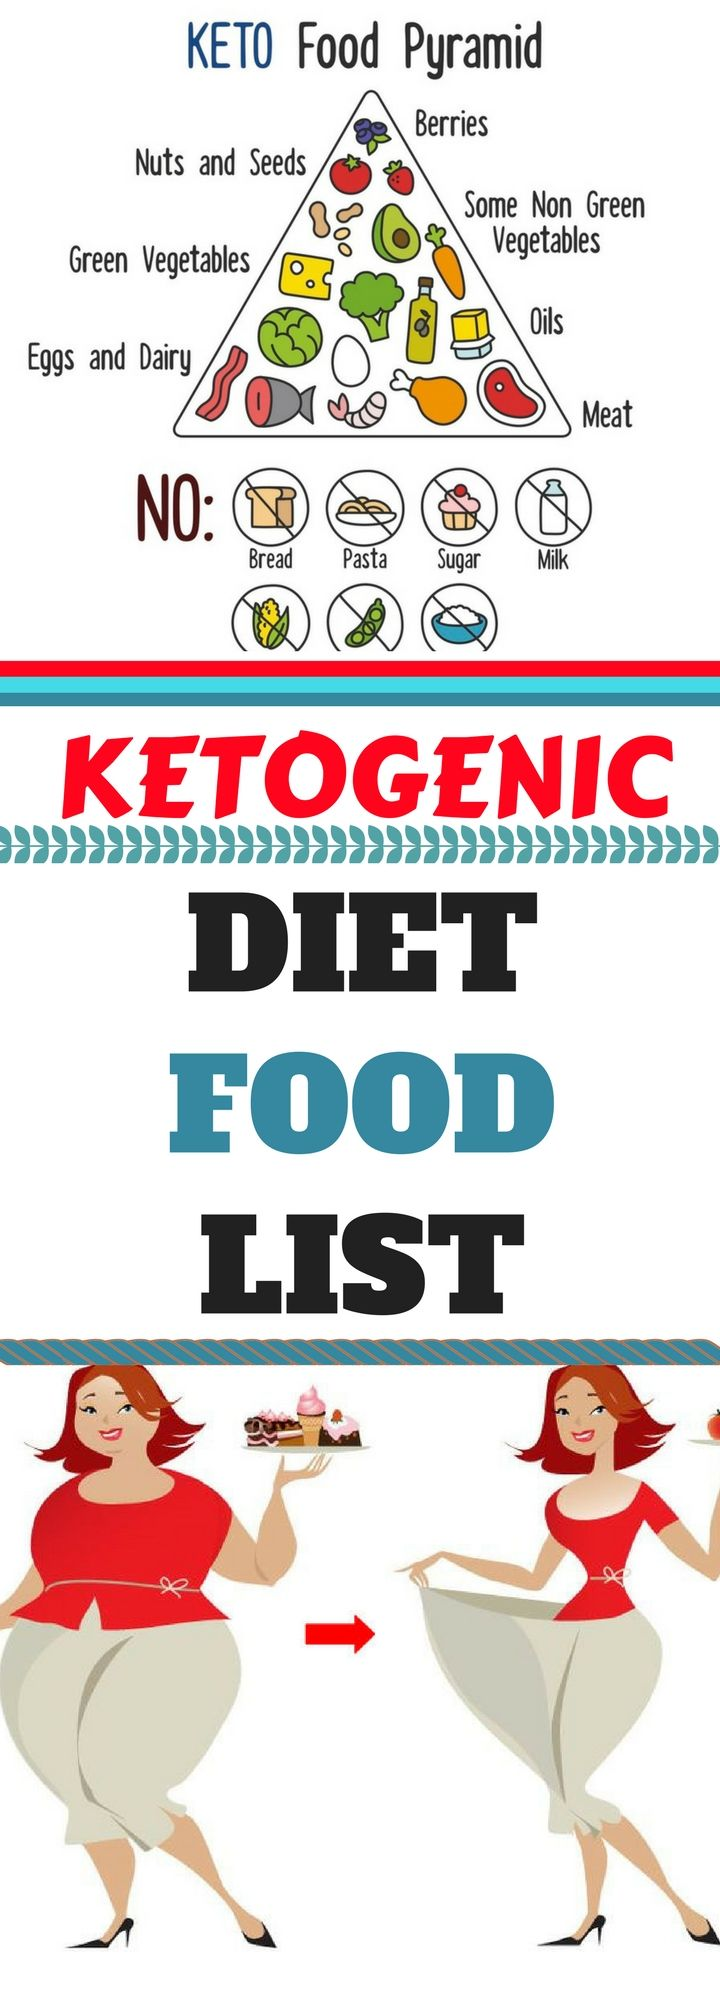 Ketogenic diet food list ketogenic diet food list